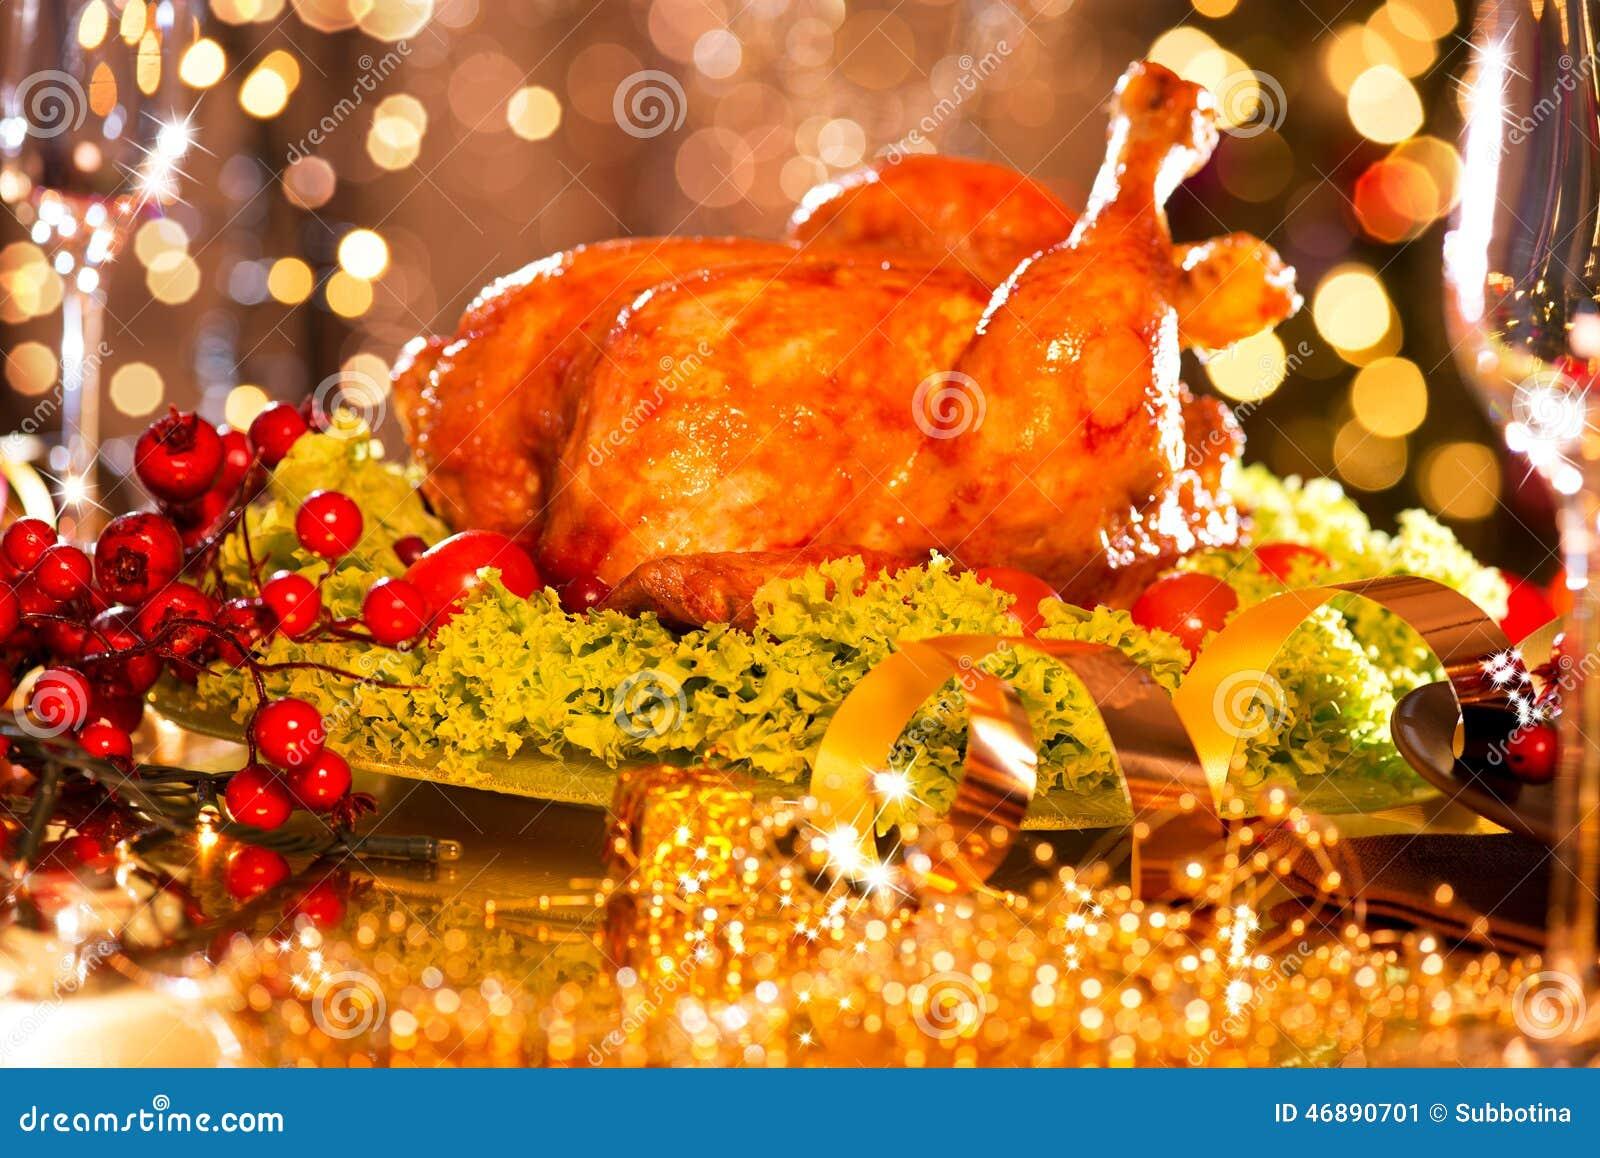 how to make a turkey roast for christmas